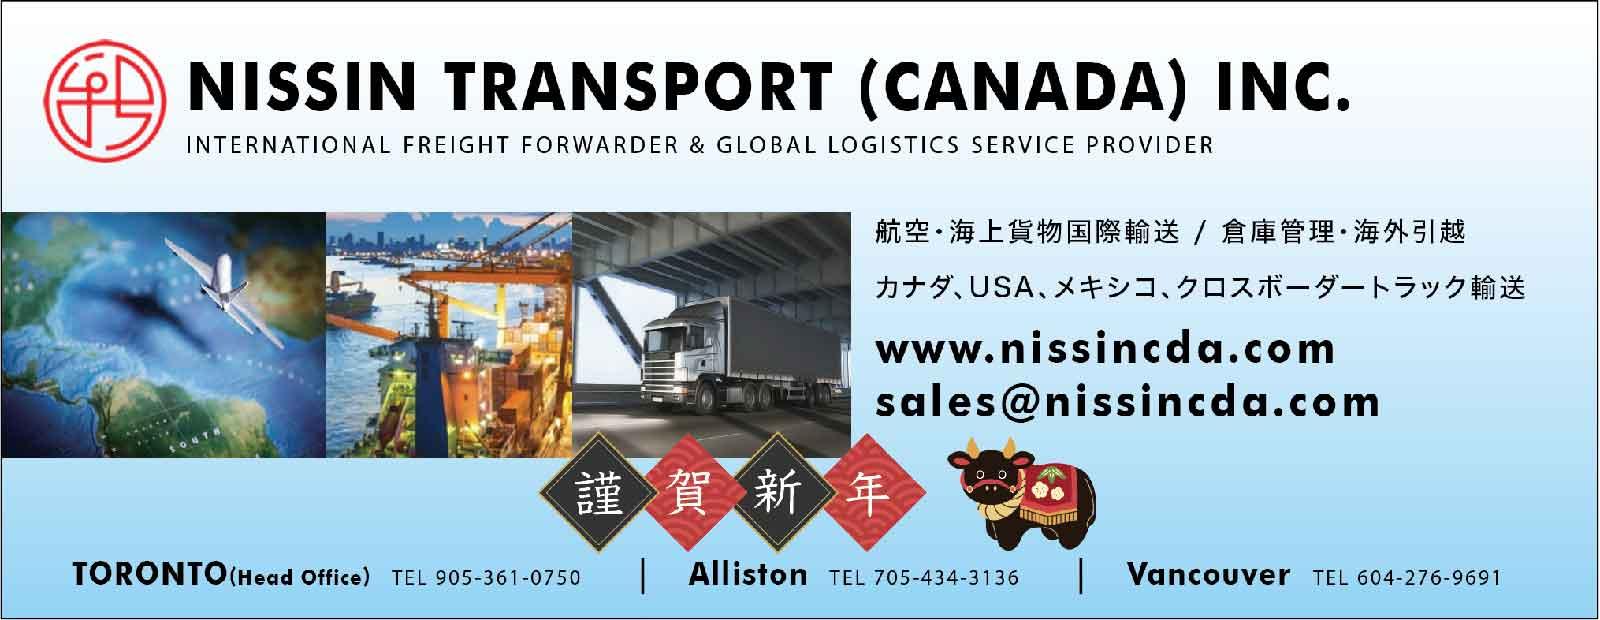 NISSIN TRANSPORT (CANADA) INC.